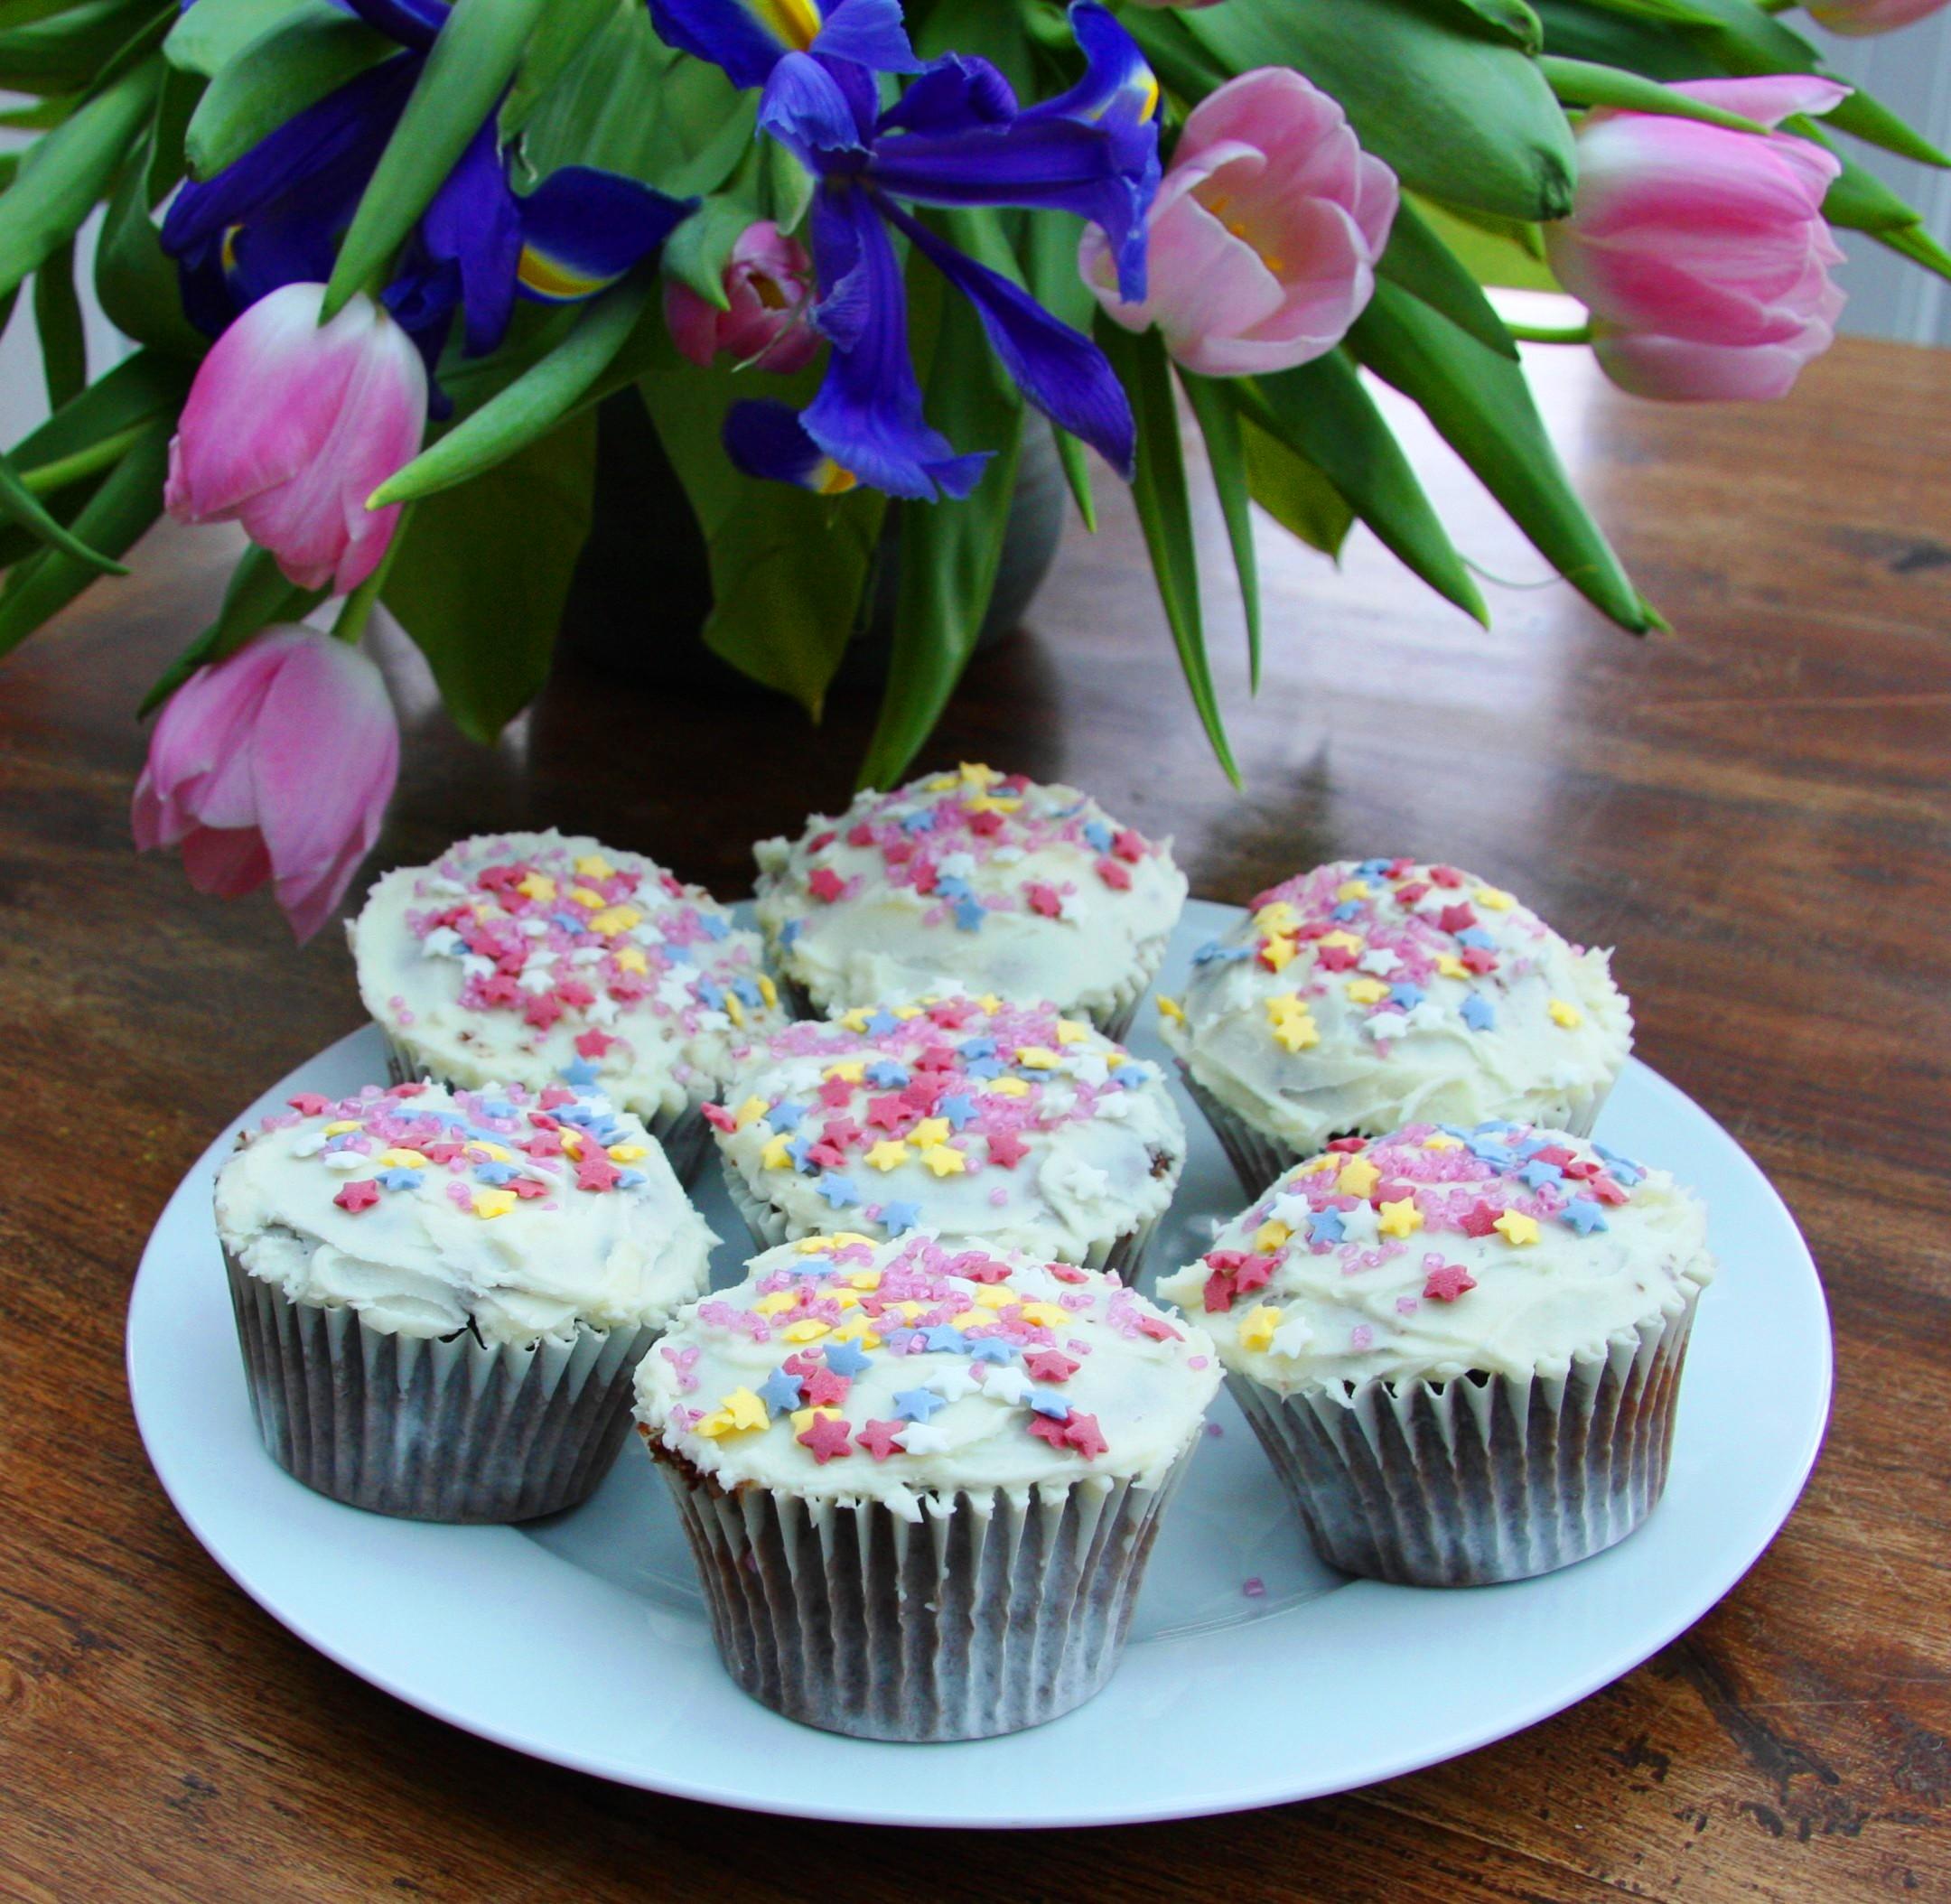 Superb Hummingbird Chocolate Cupcakes Sweet And Easy Funny Birthday Cards Online Necthendildamsfinfo